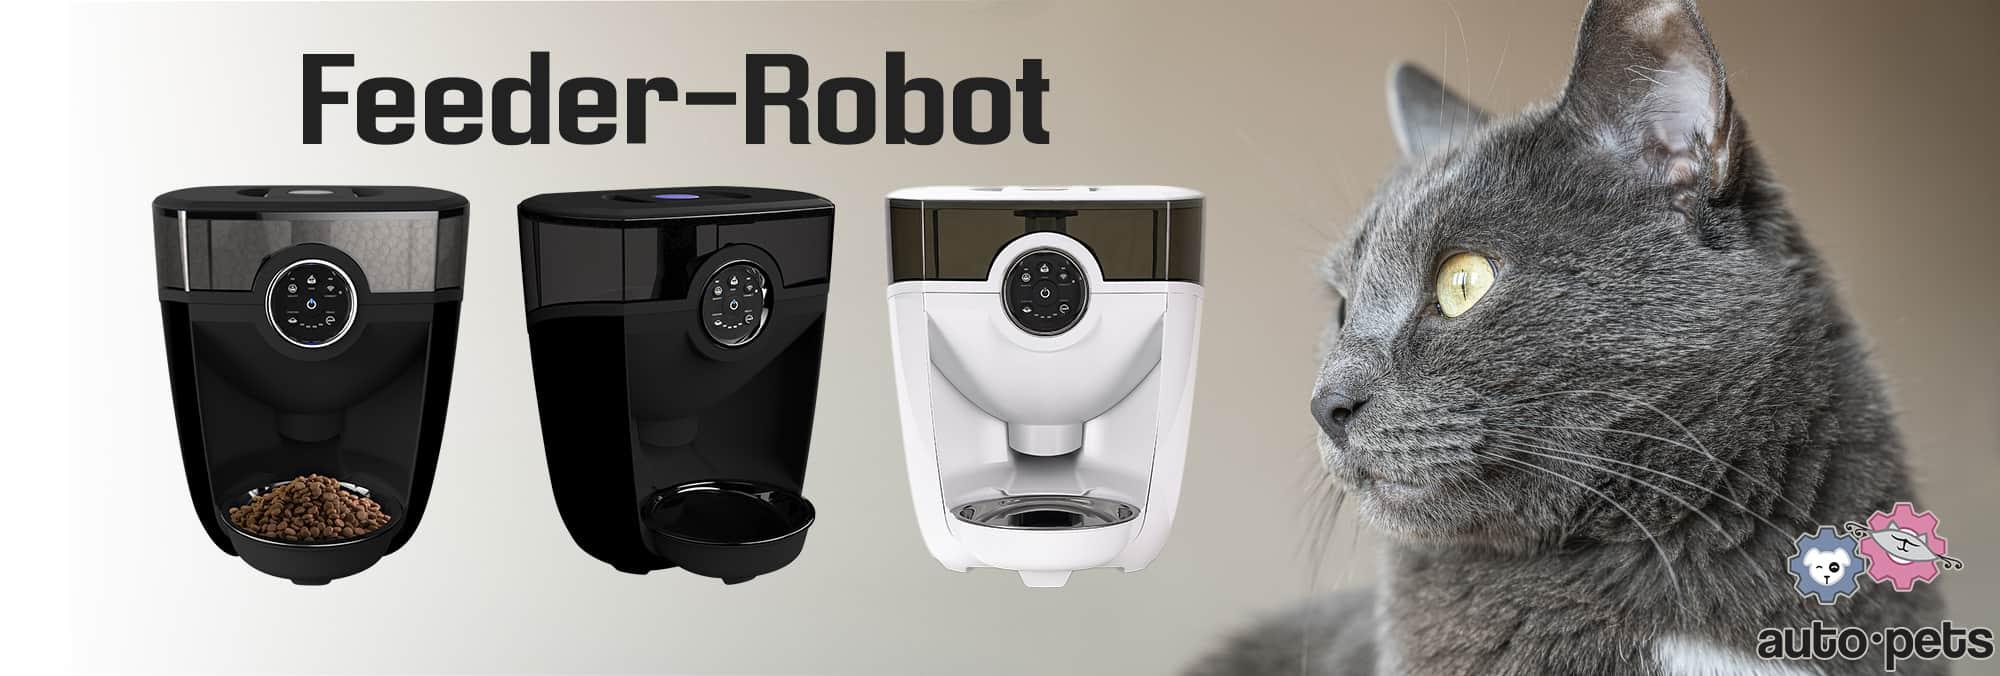 Feeder-Robot review